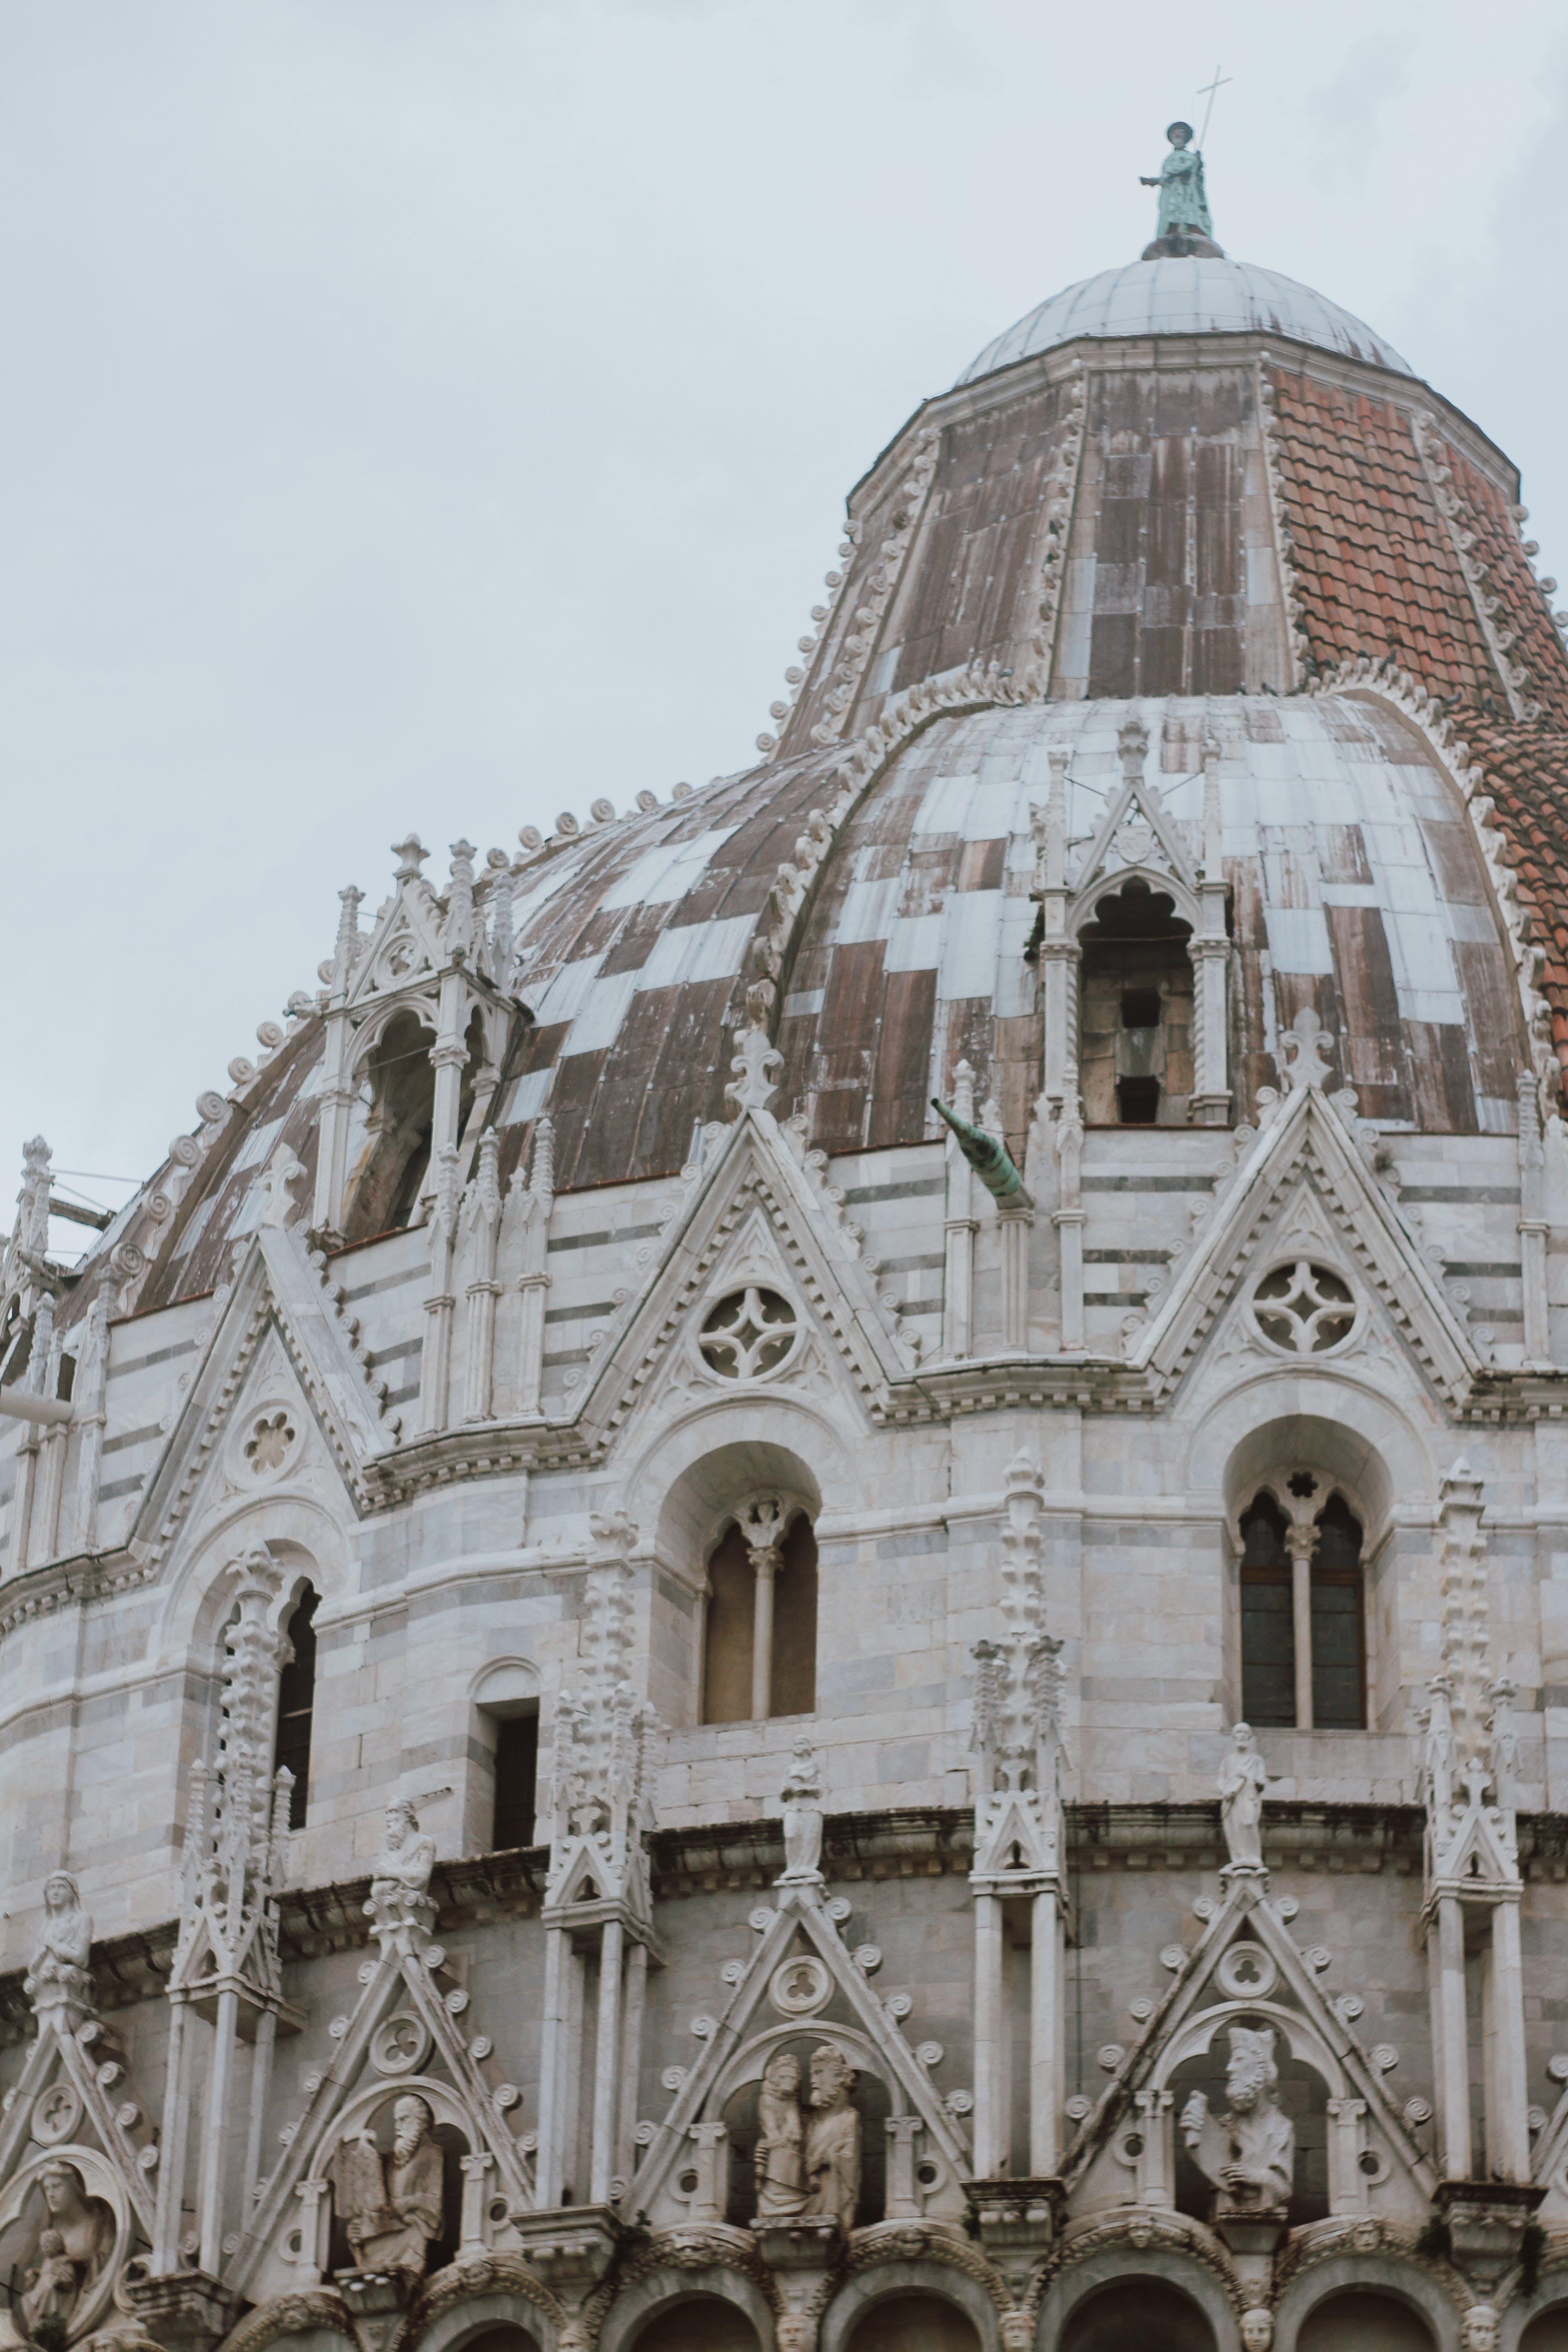 Kostenloses Stock Foto zu architektur, italien, pisa, renaissance